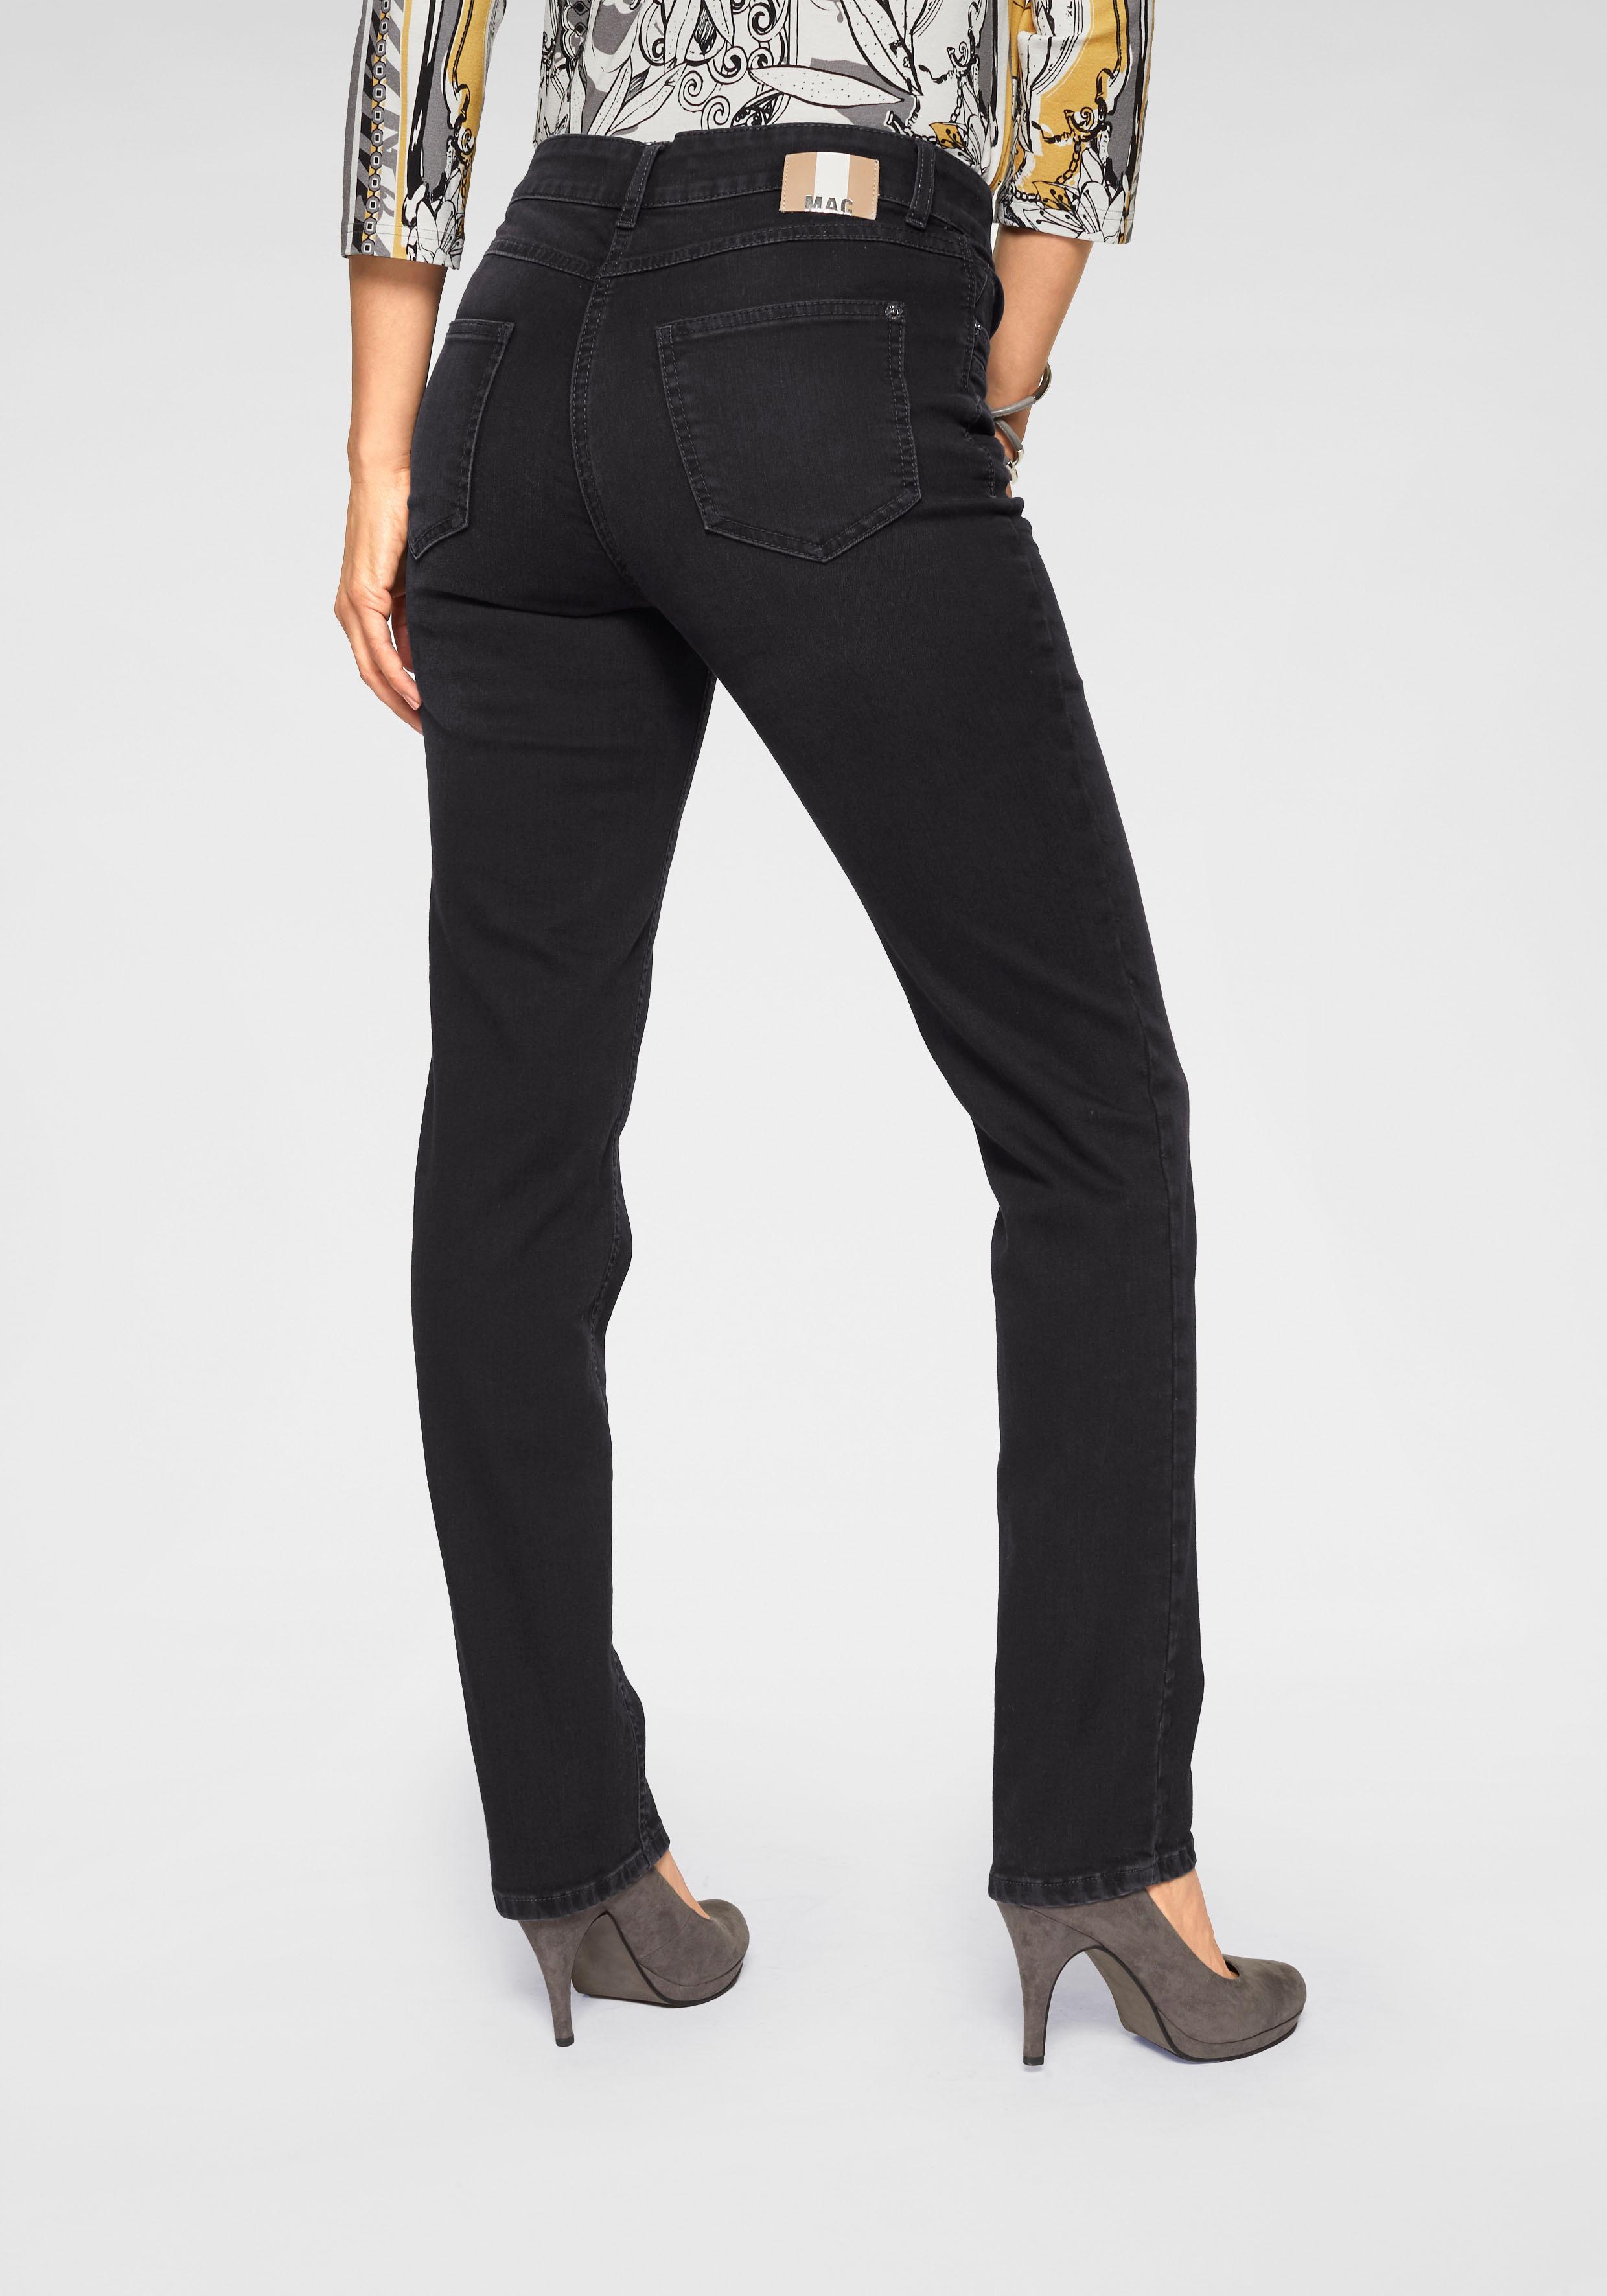 MAC Gerade Jeans Angela New | Bekleidung > Jeans > Gerade Jeans | Schwarz | Mac